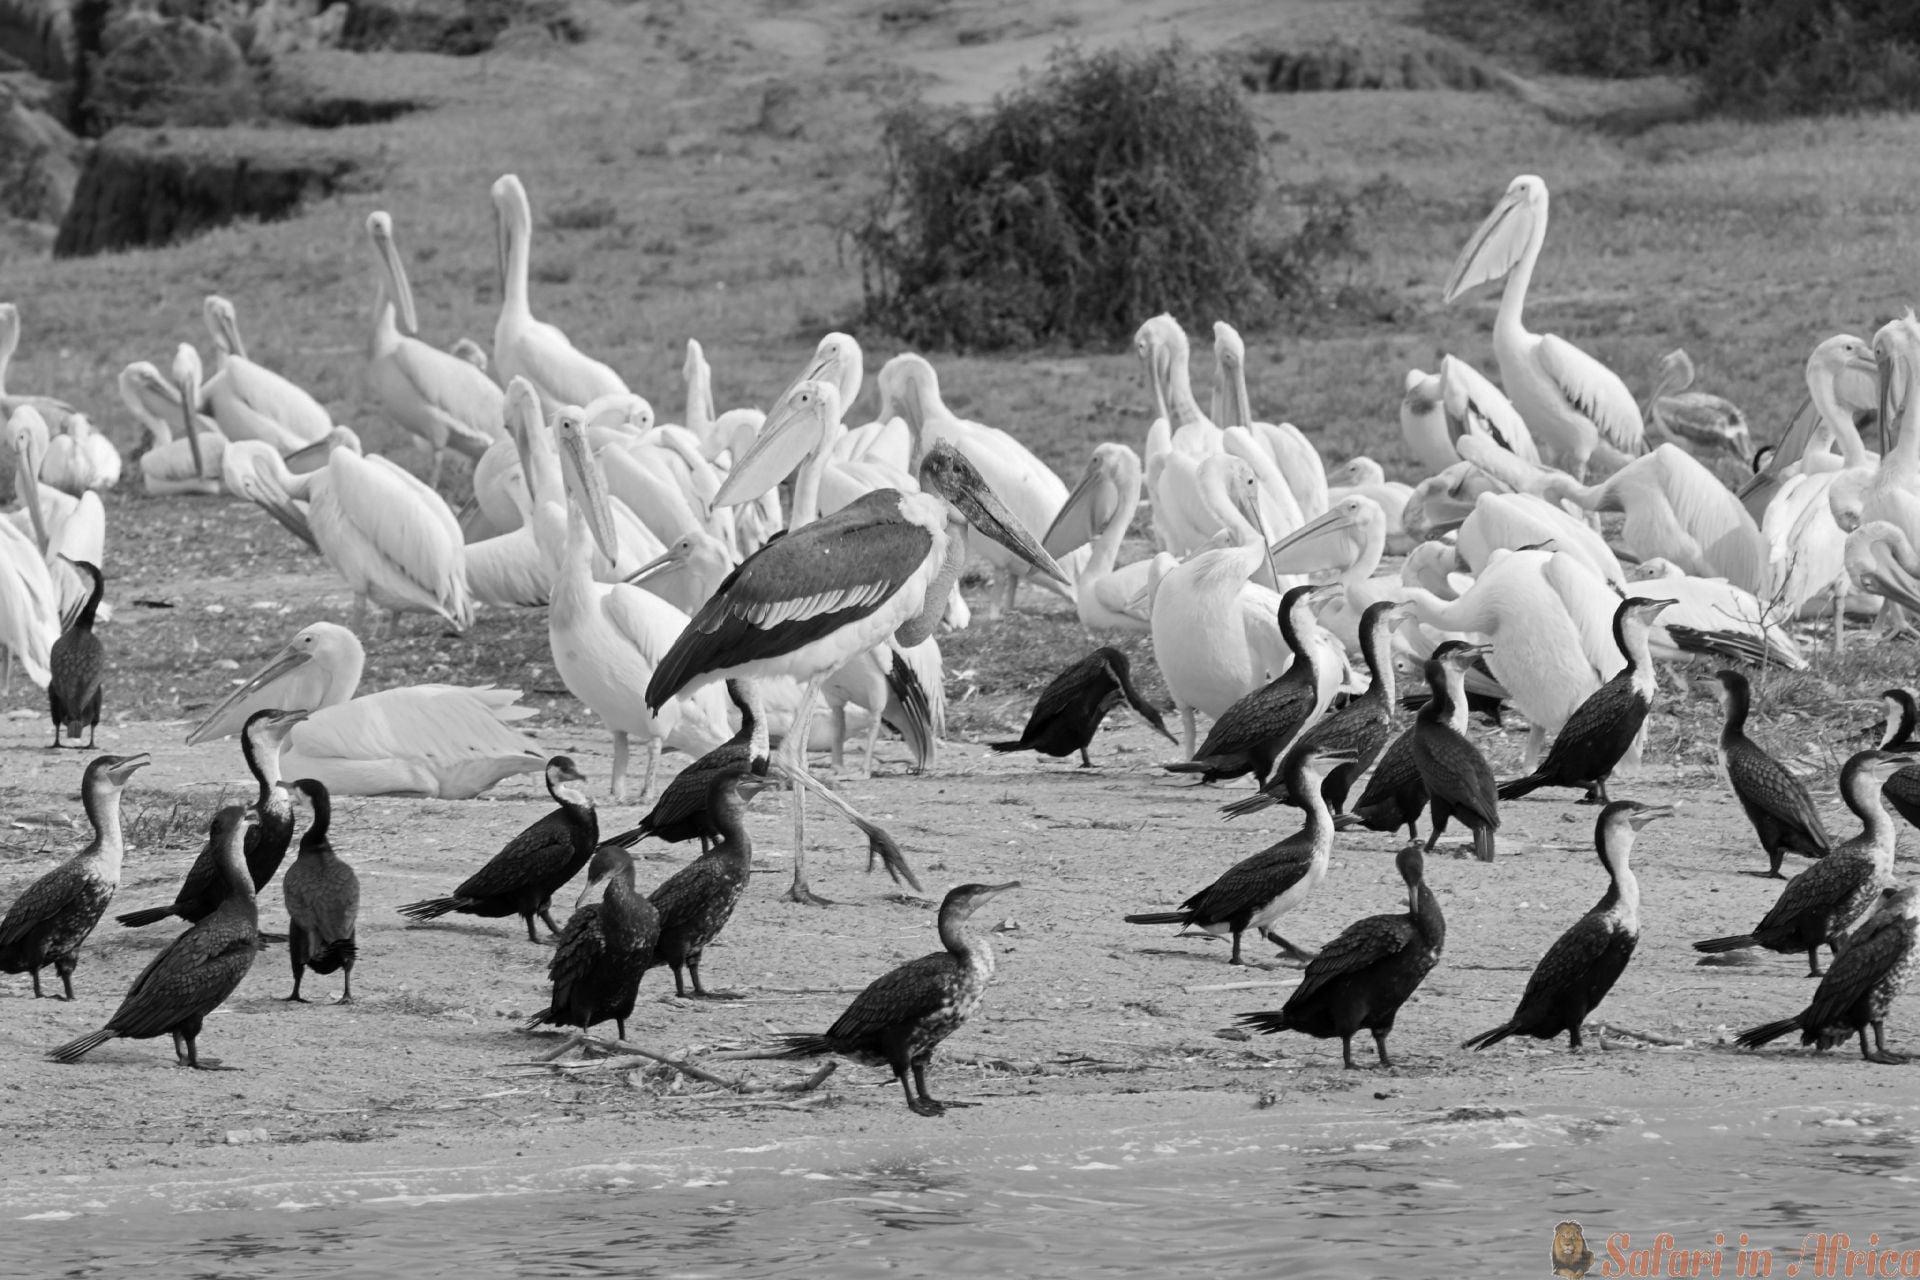 Vogels in het Queen Elizabeth National Park in Oeganda B&W